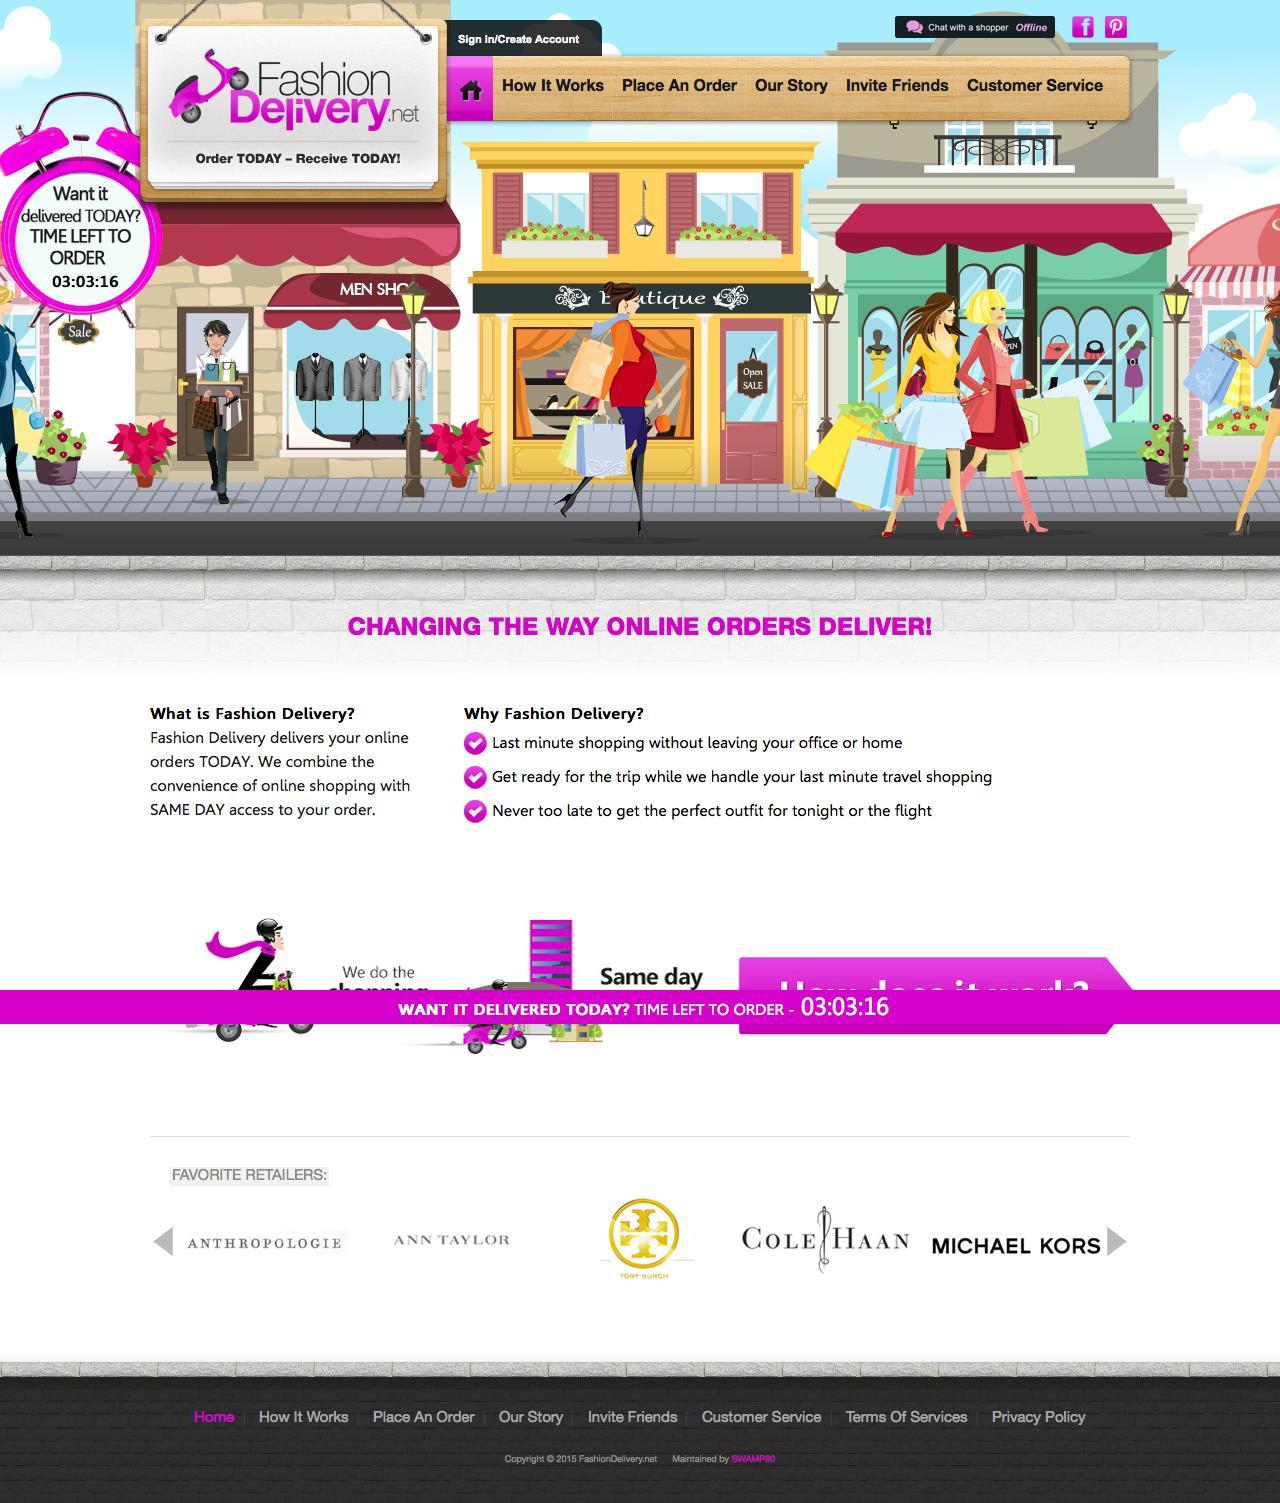 Screenshot of fashiondelivery.net - NJ Personal Shopper - Same Day Delivery Service  - FashionDelivery.net - captured July 27, 2015